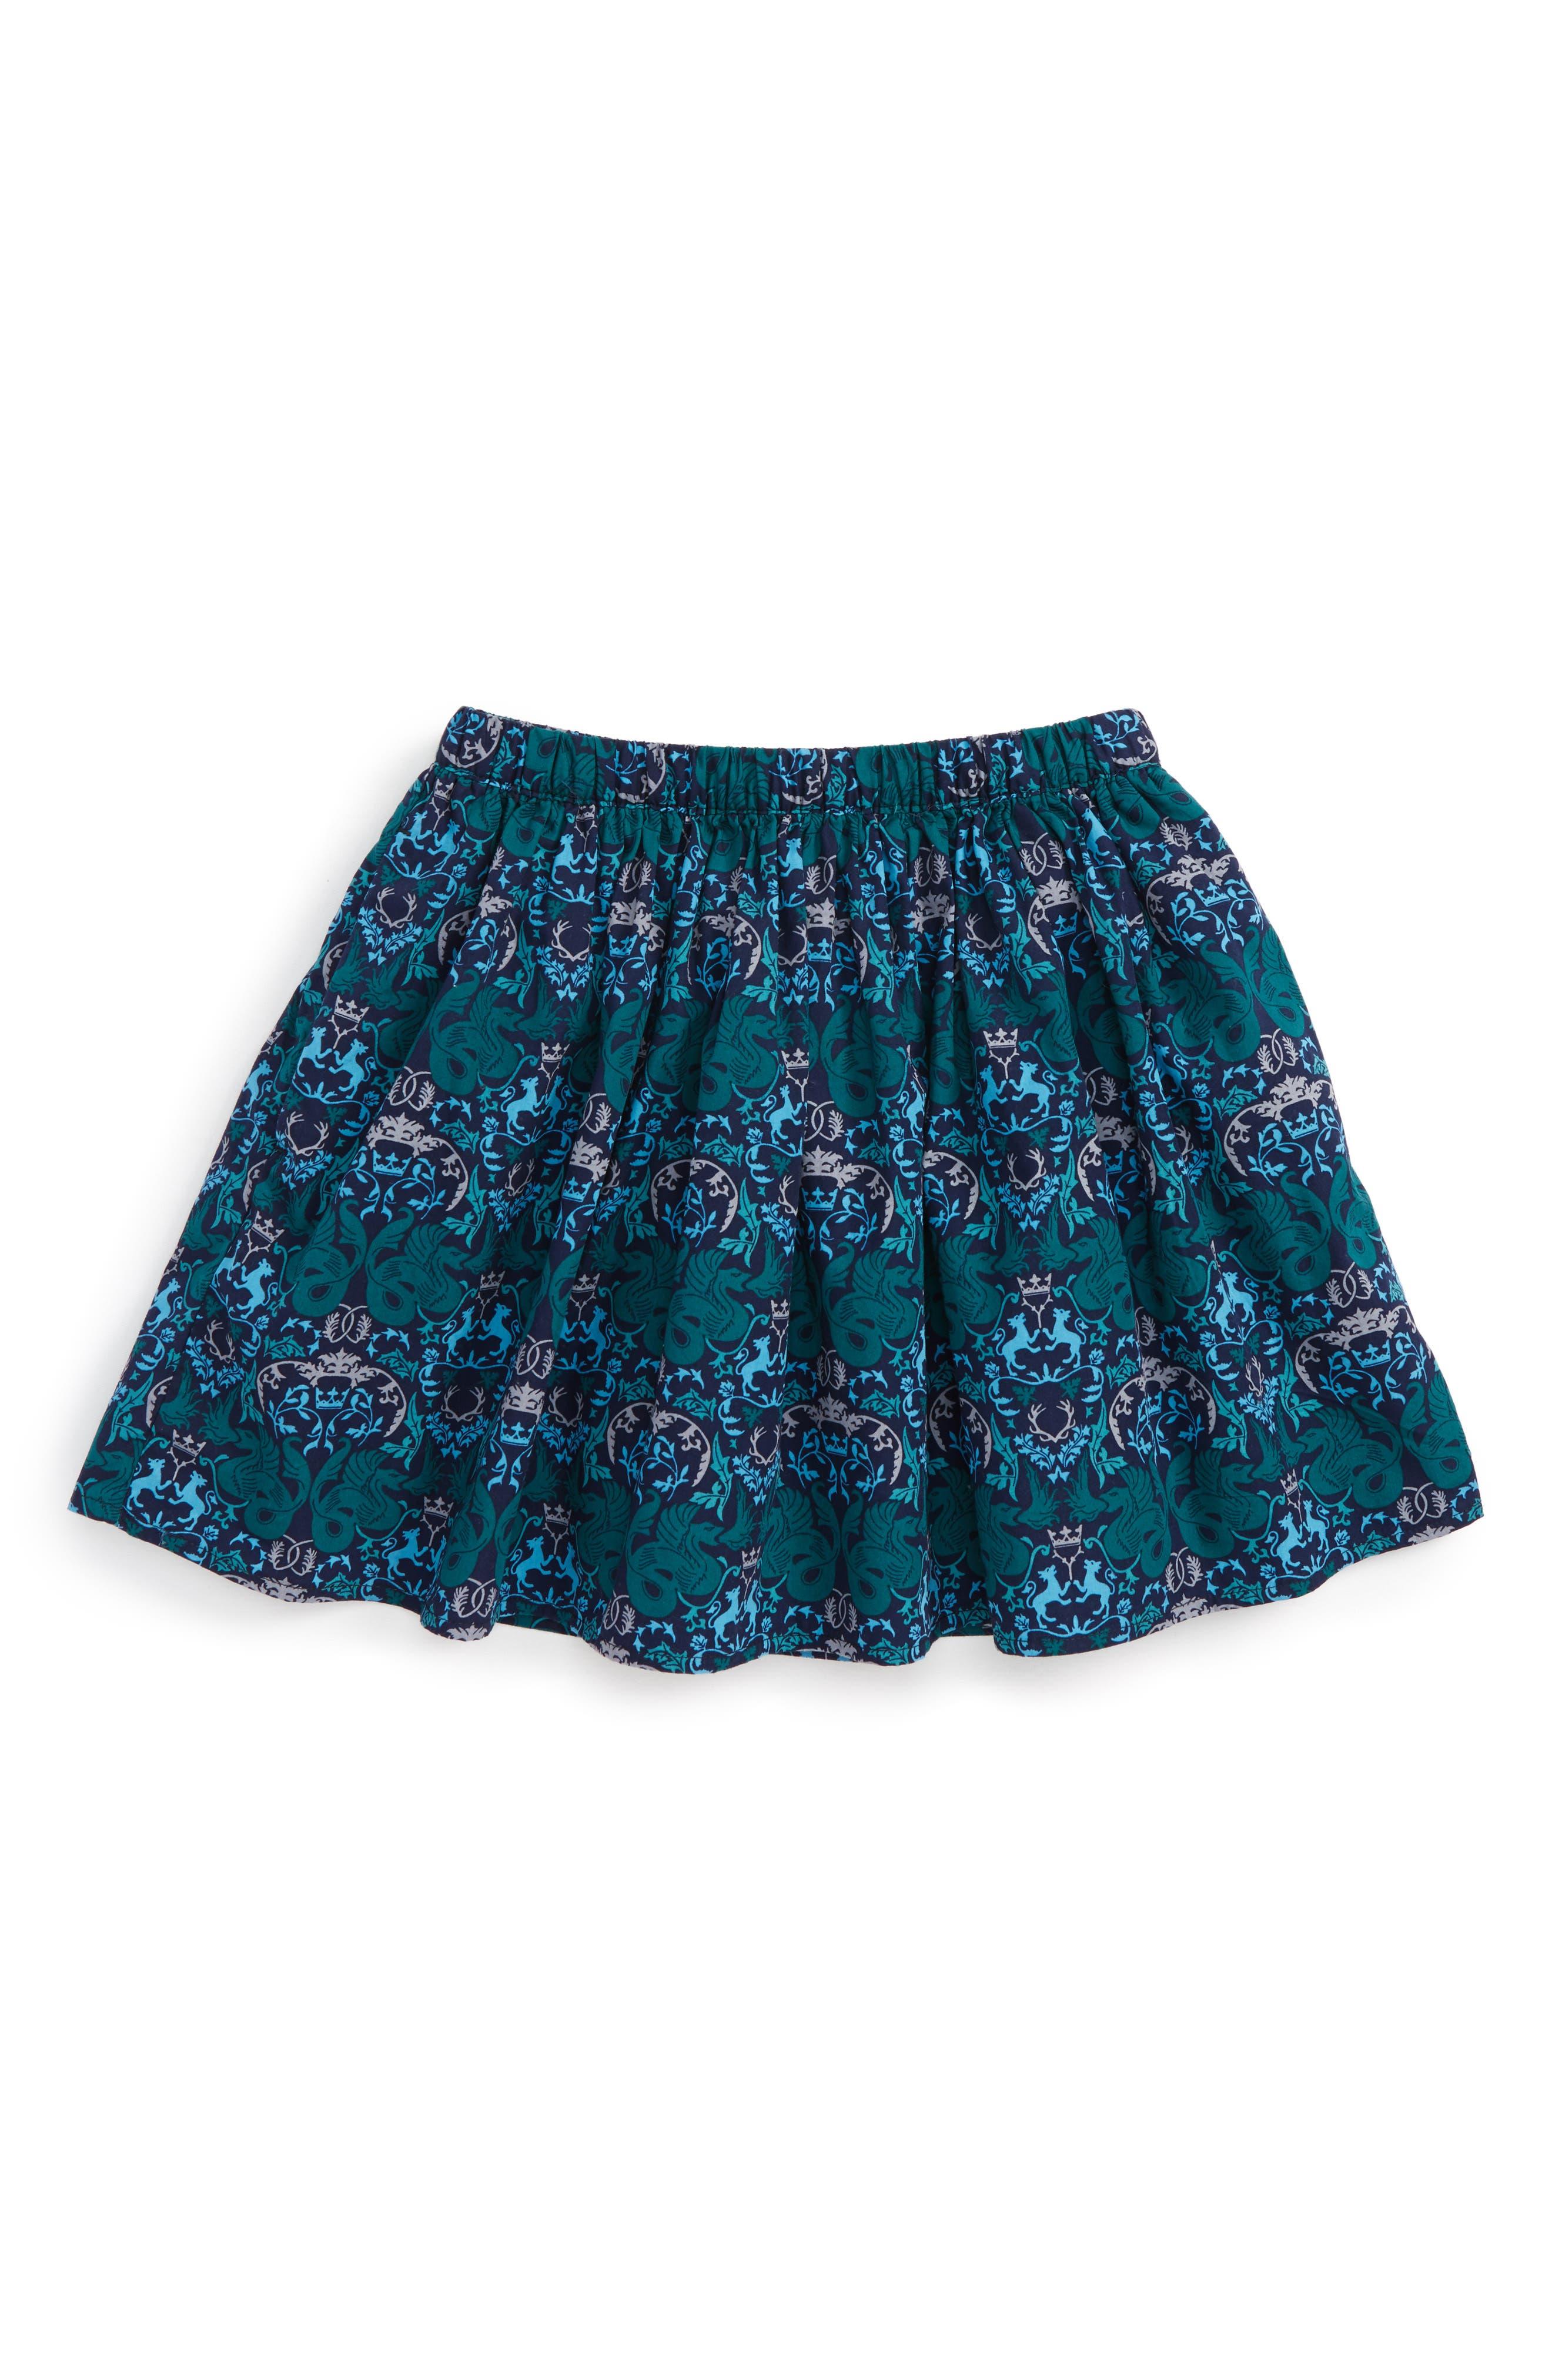 Cadha Print Twirl Skirt,                             Main thumbnail 1, color,                             411